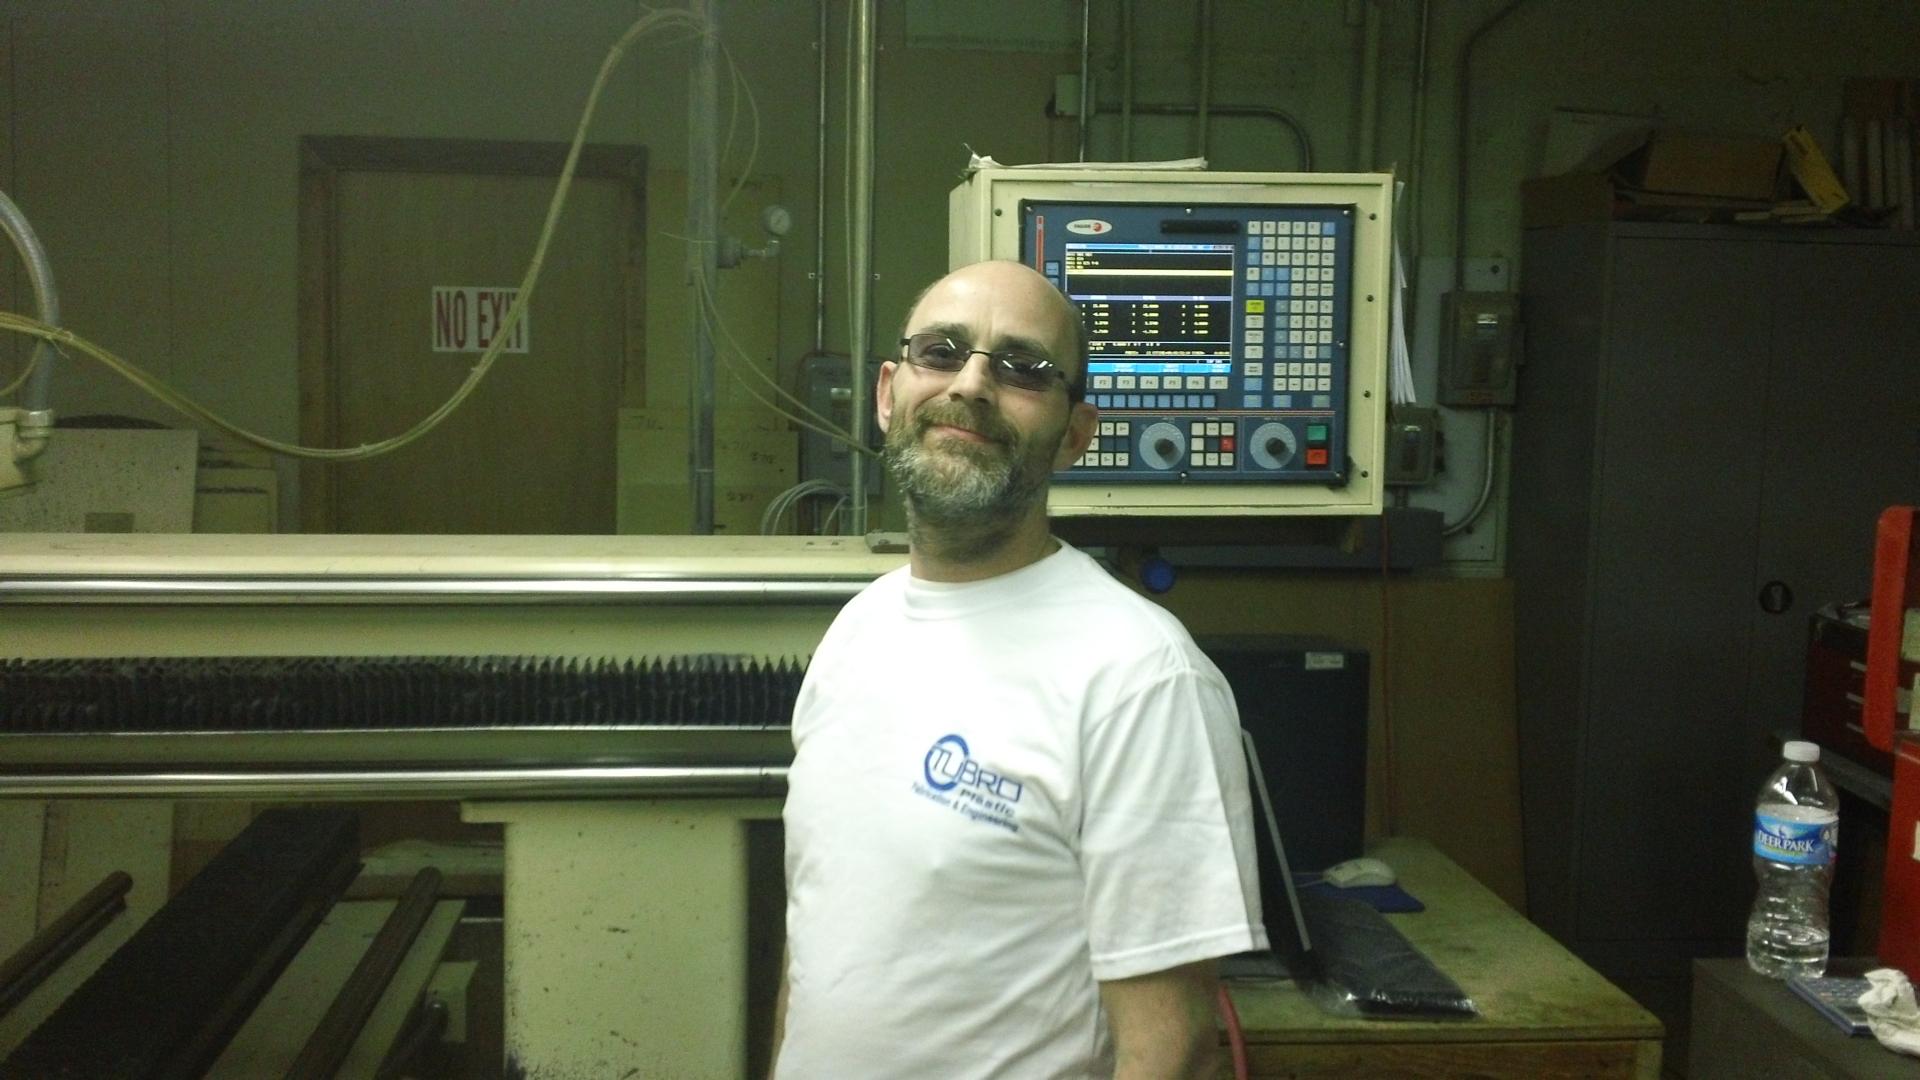 Employee Spotlight: Charles DeJulio